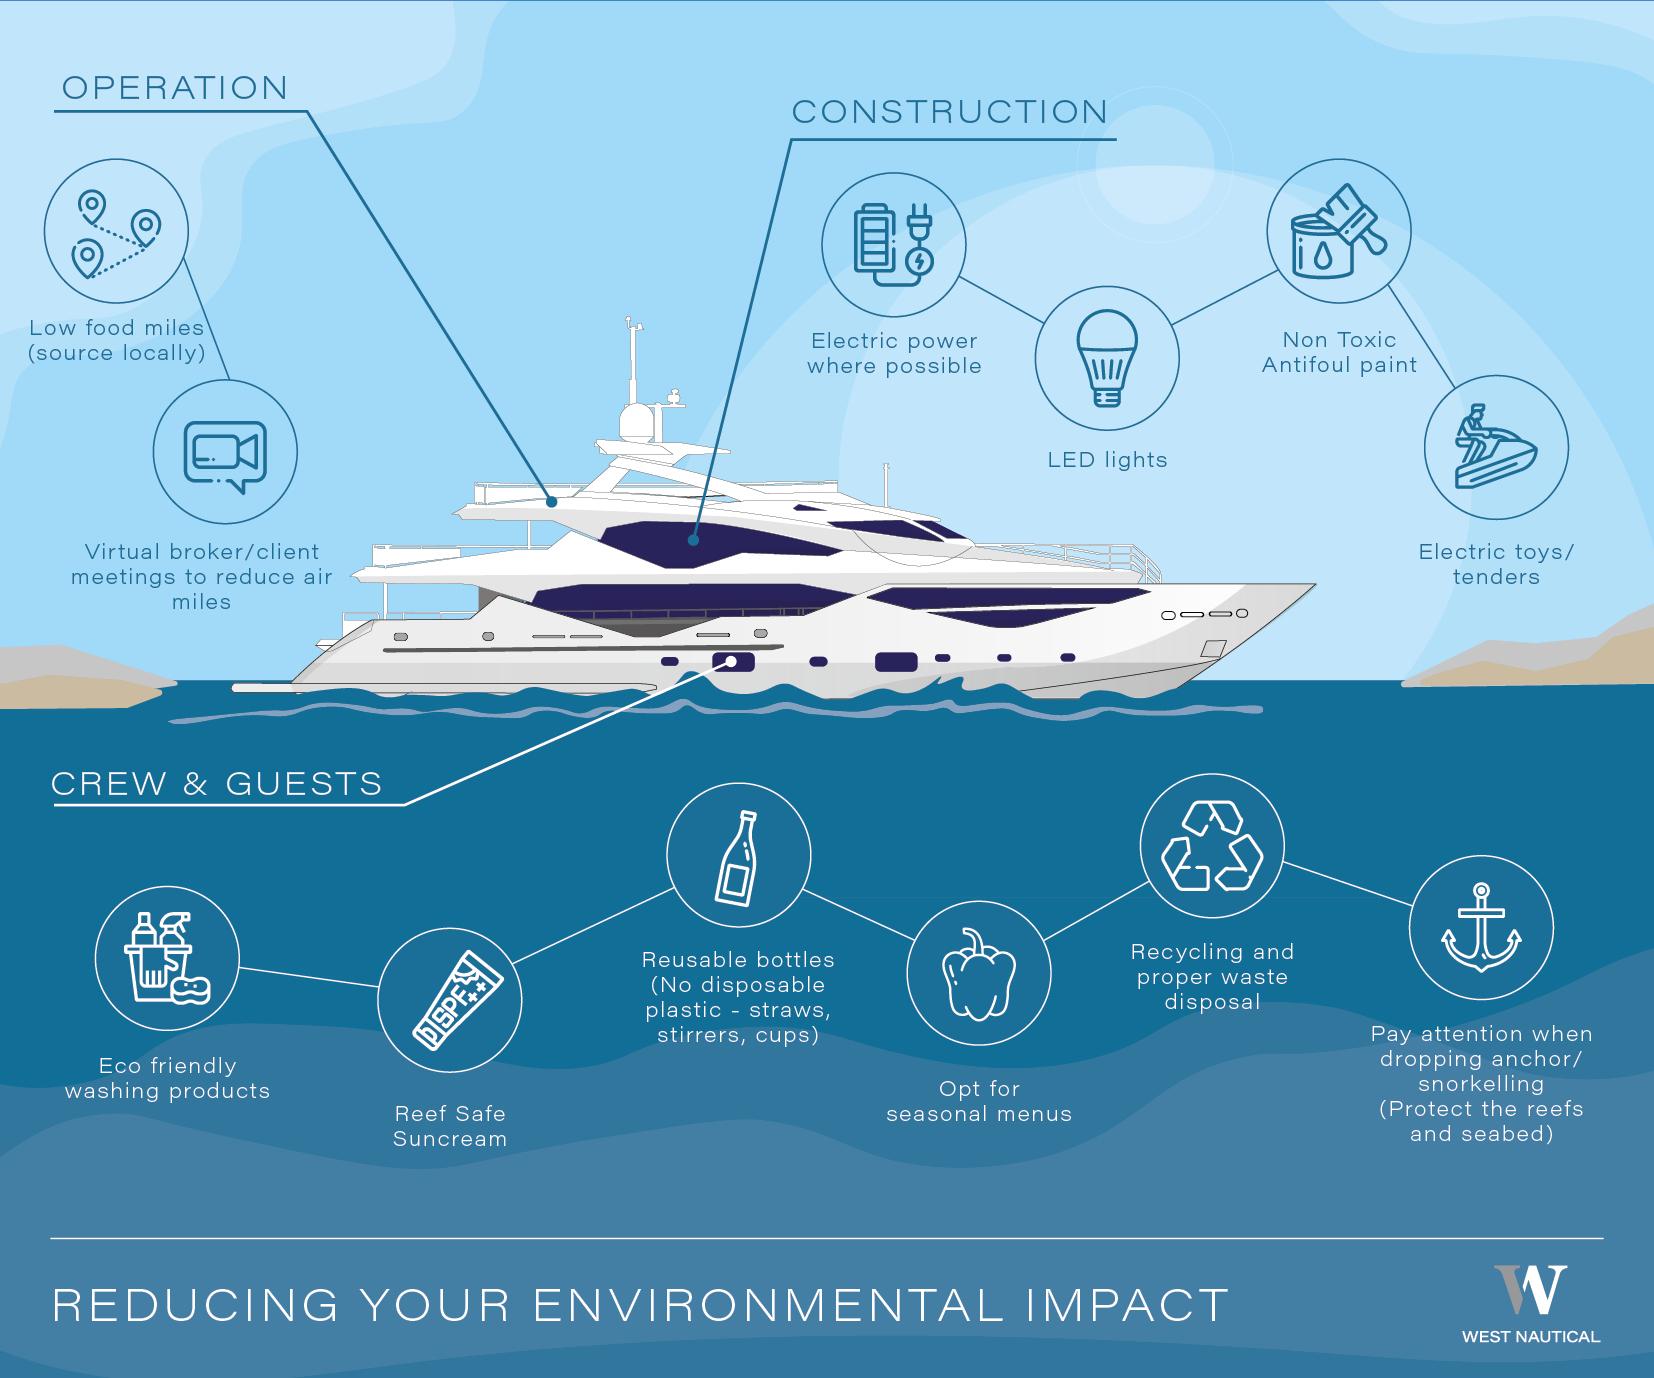 West Nautiucal environment infographic